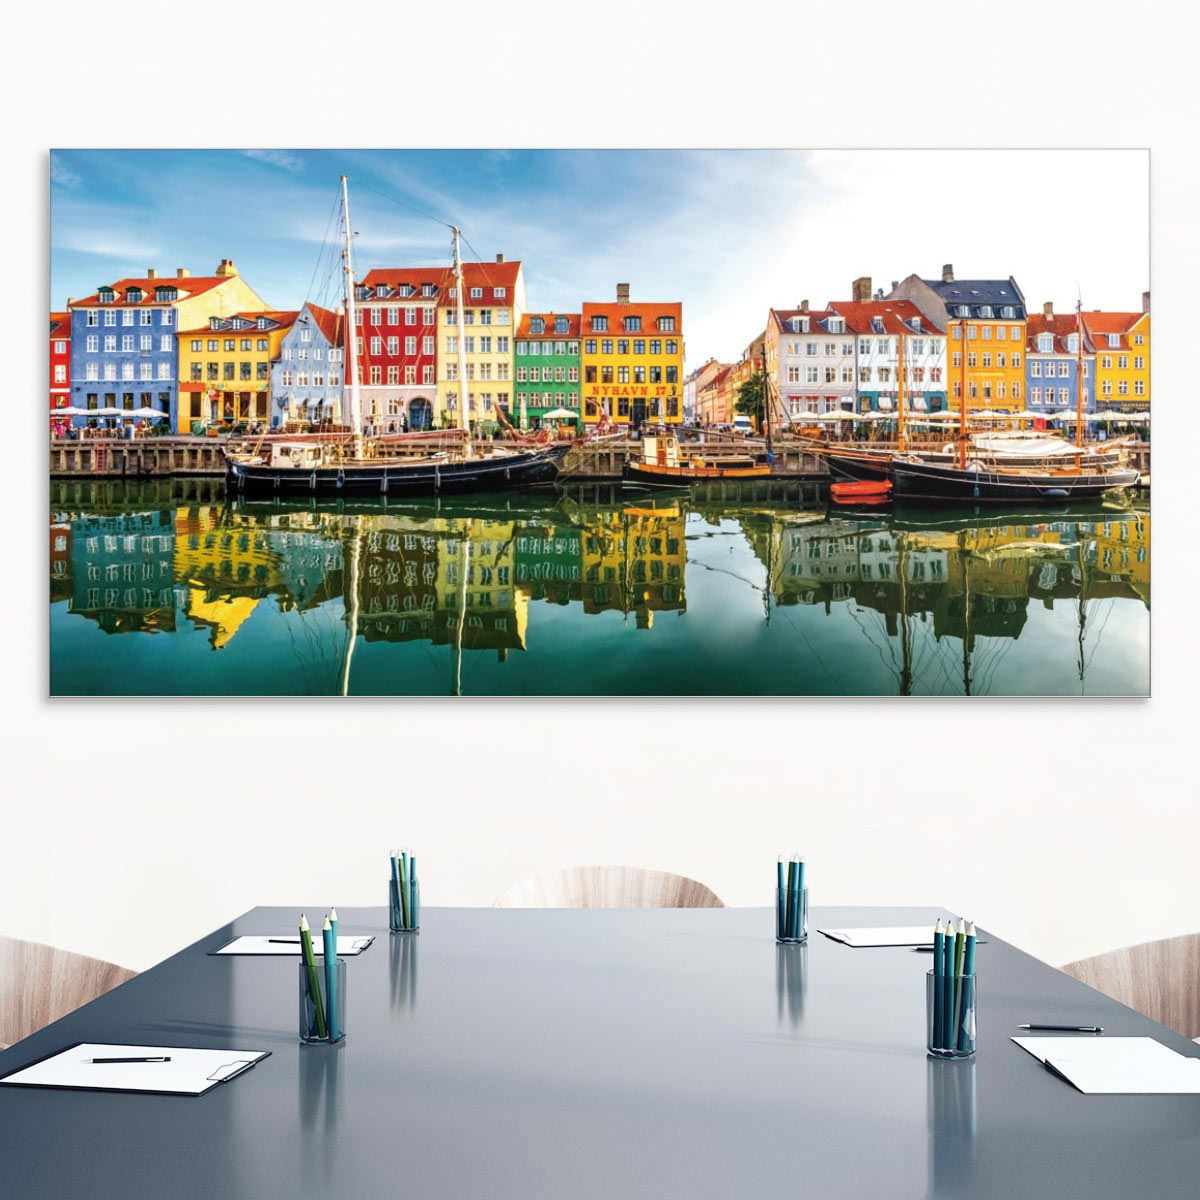 Akustikbild Kopenhagen, Nyhavn, Dänemark